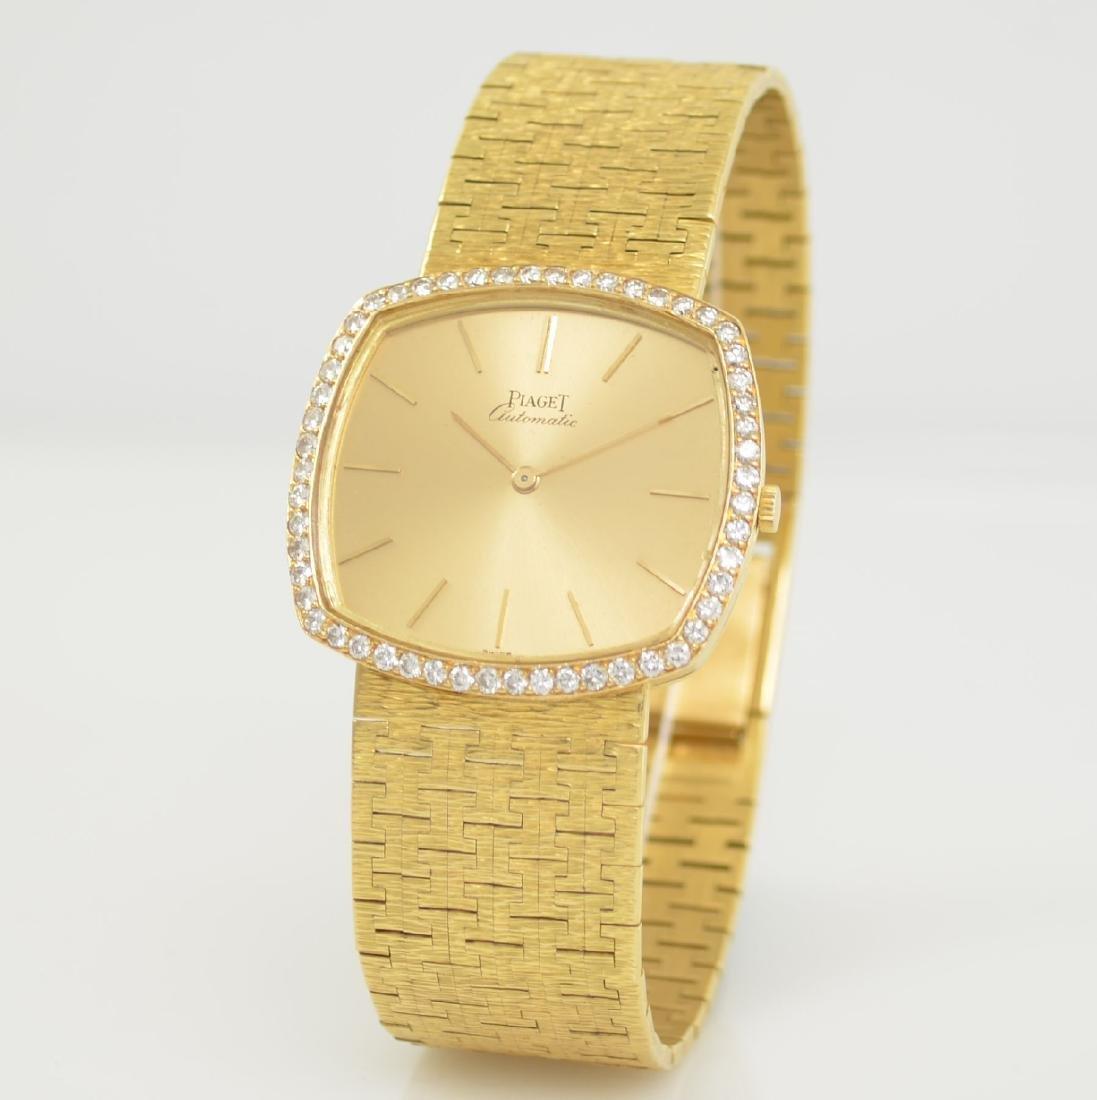 PIAGET 18k yellow gold diamond set gents wristwatch - 3